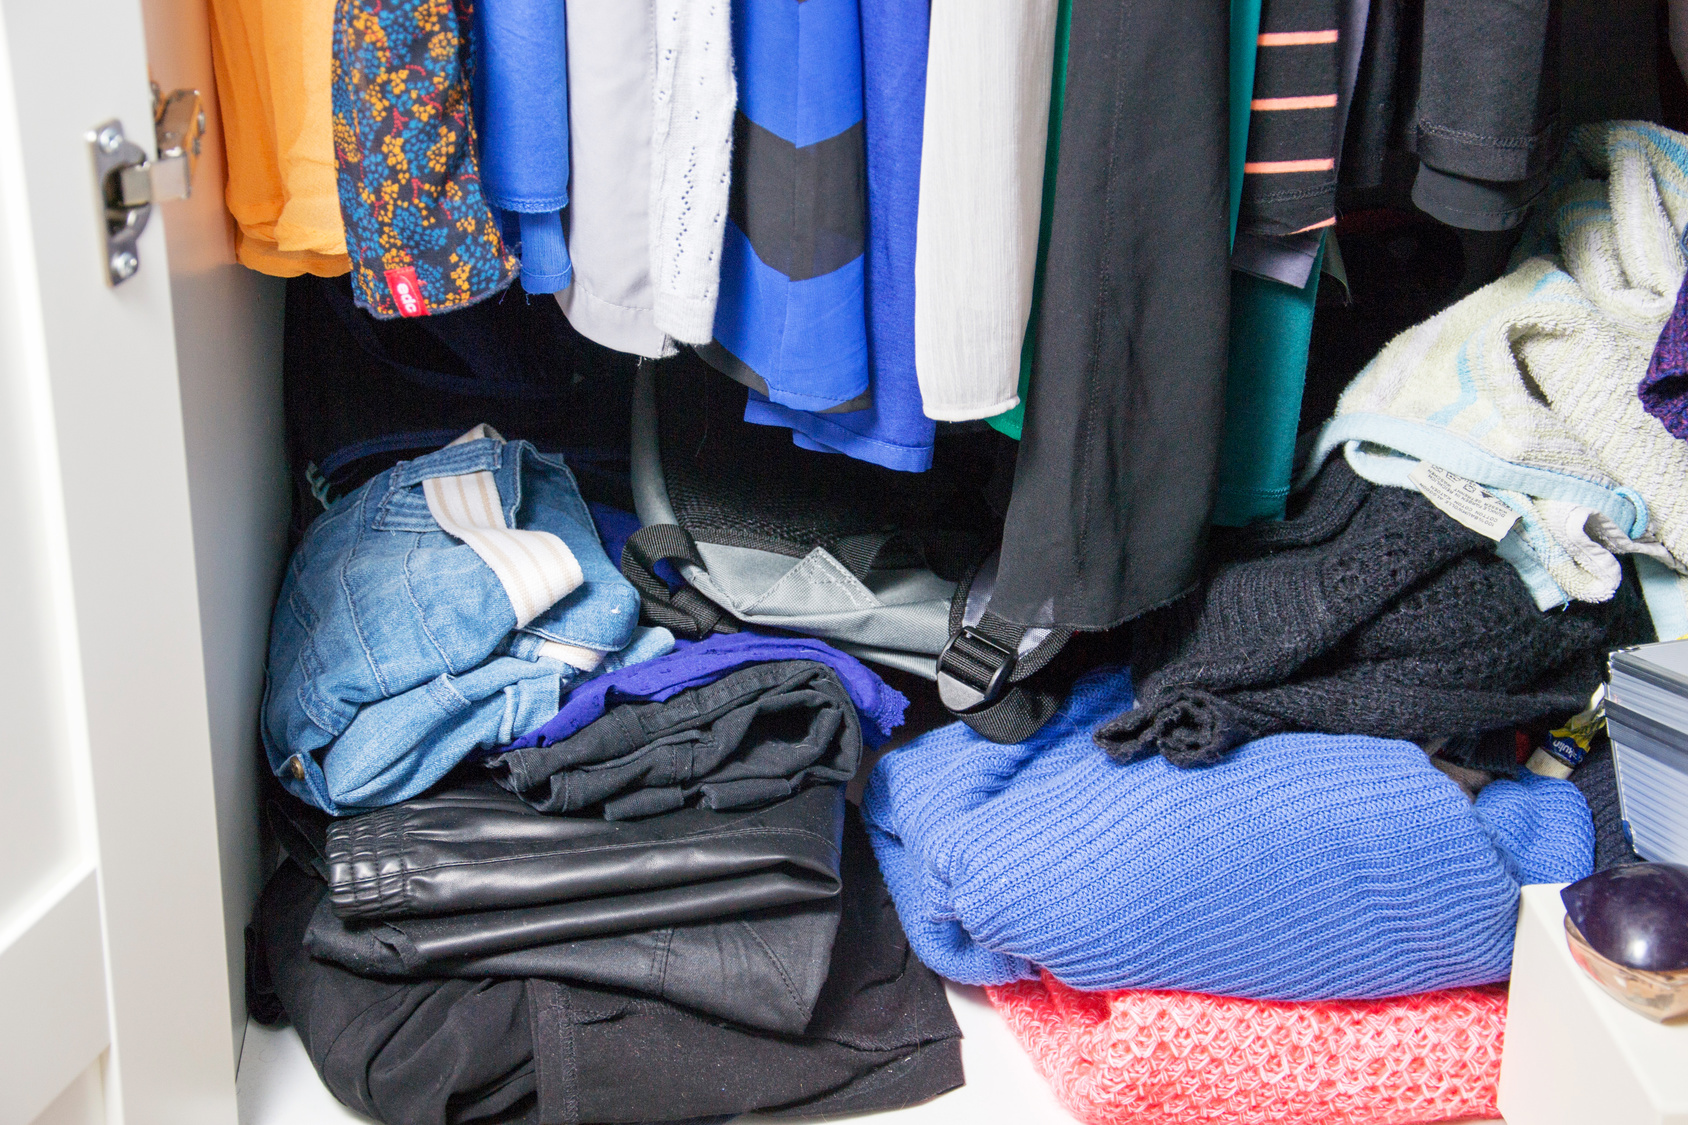 Closet Design For Small Spaces